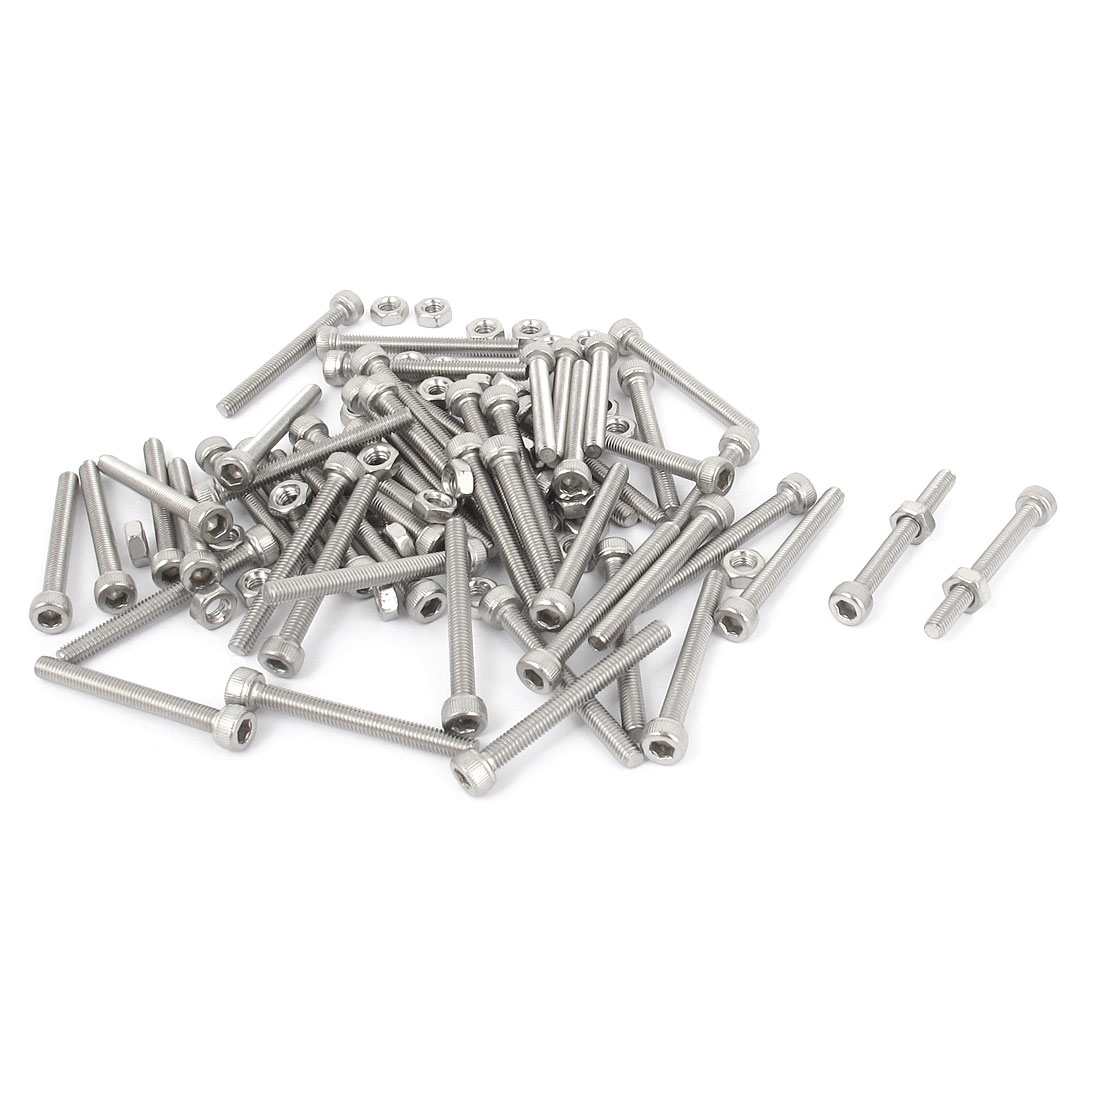 M3x28mm Stainless Steel Hex Socket Head Knurled Cap Screws Bolts Nut Set 50Pcs